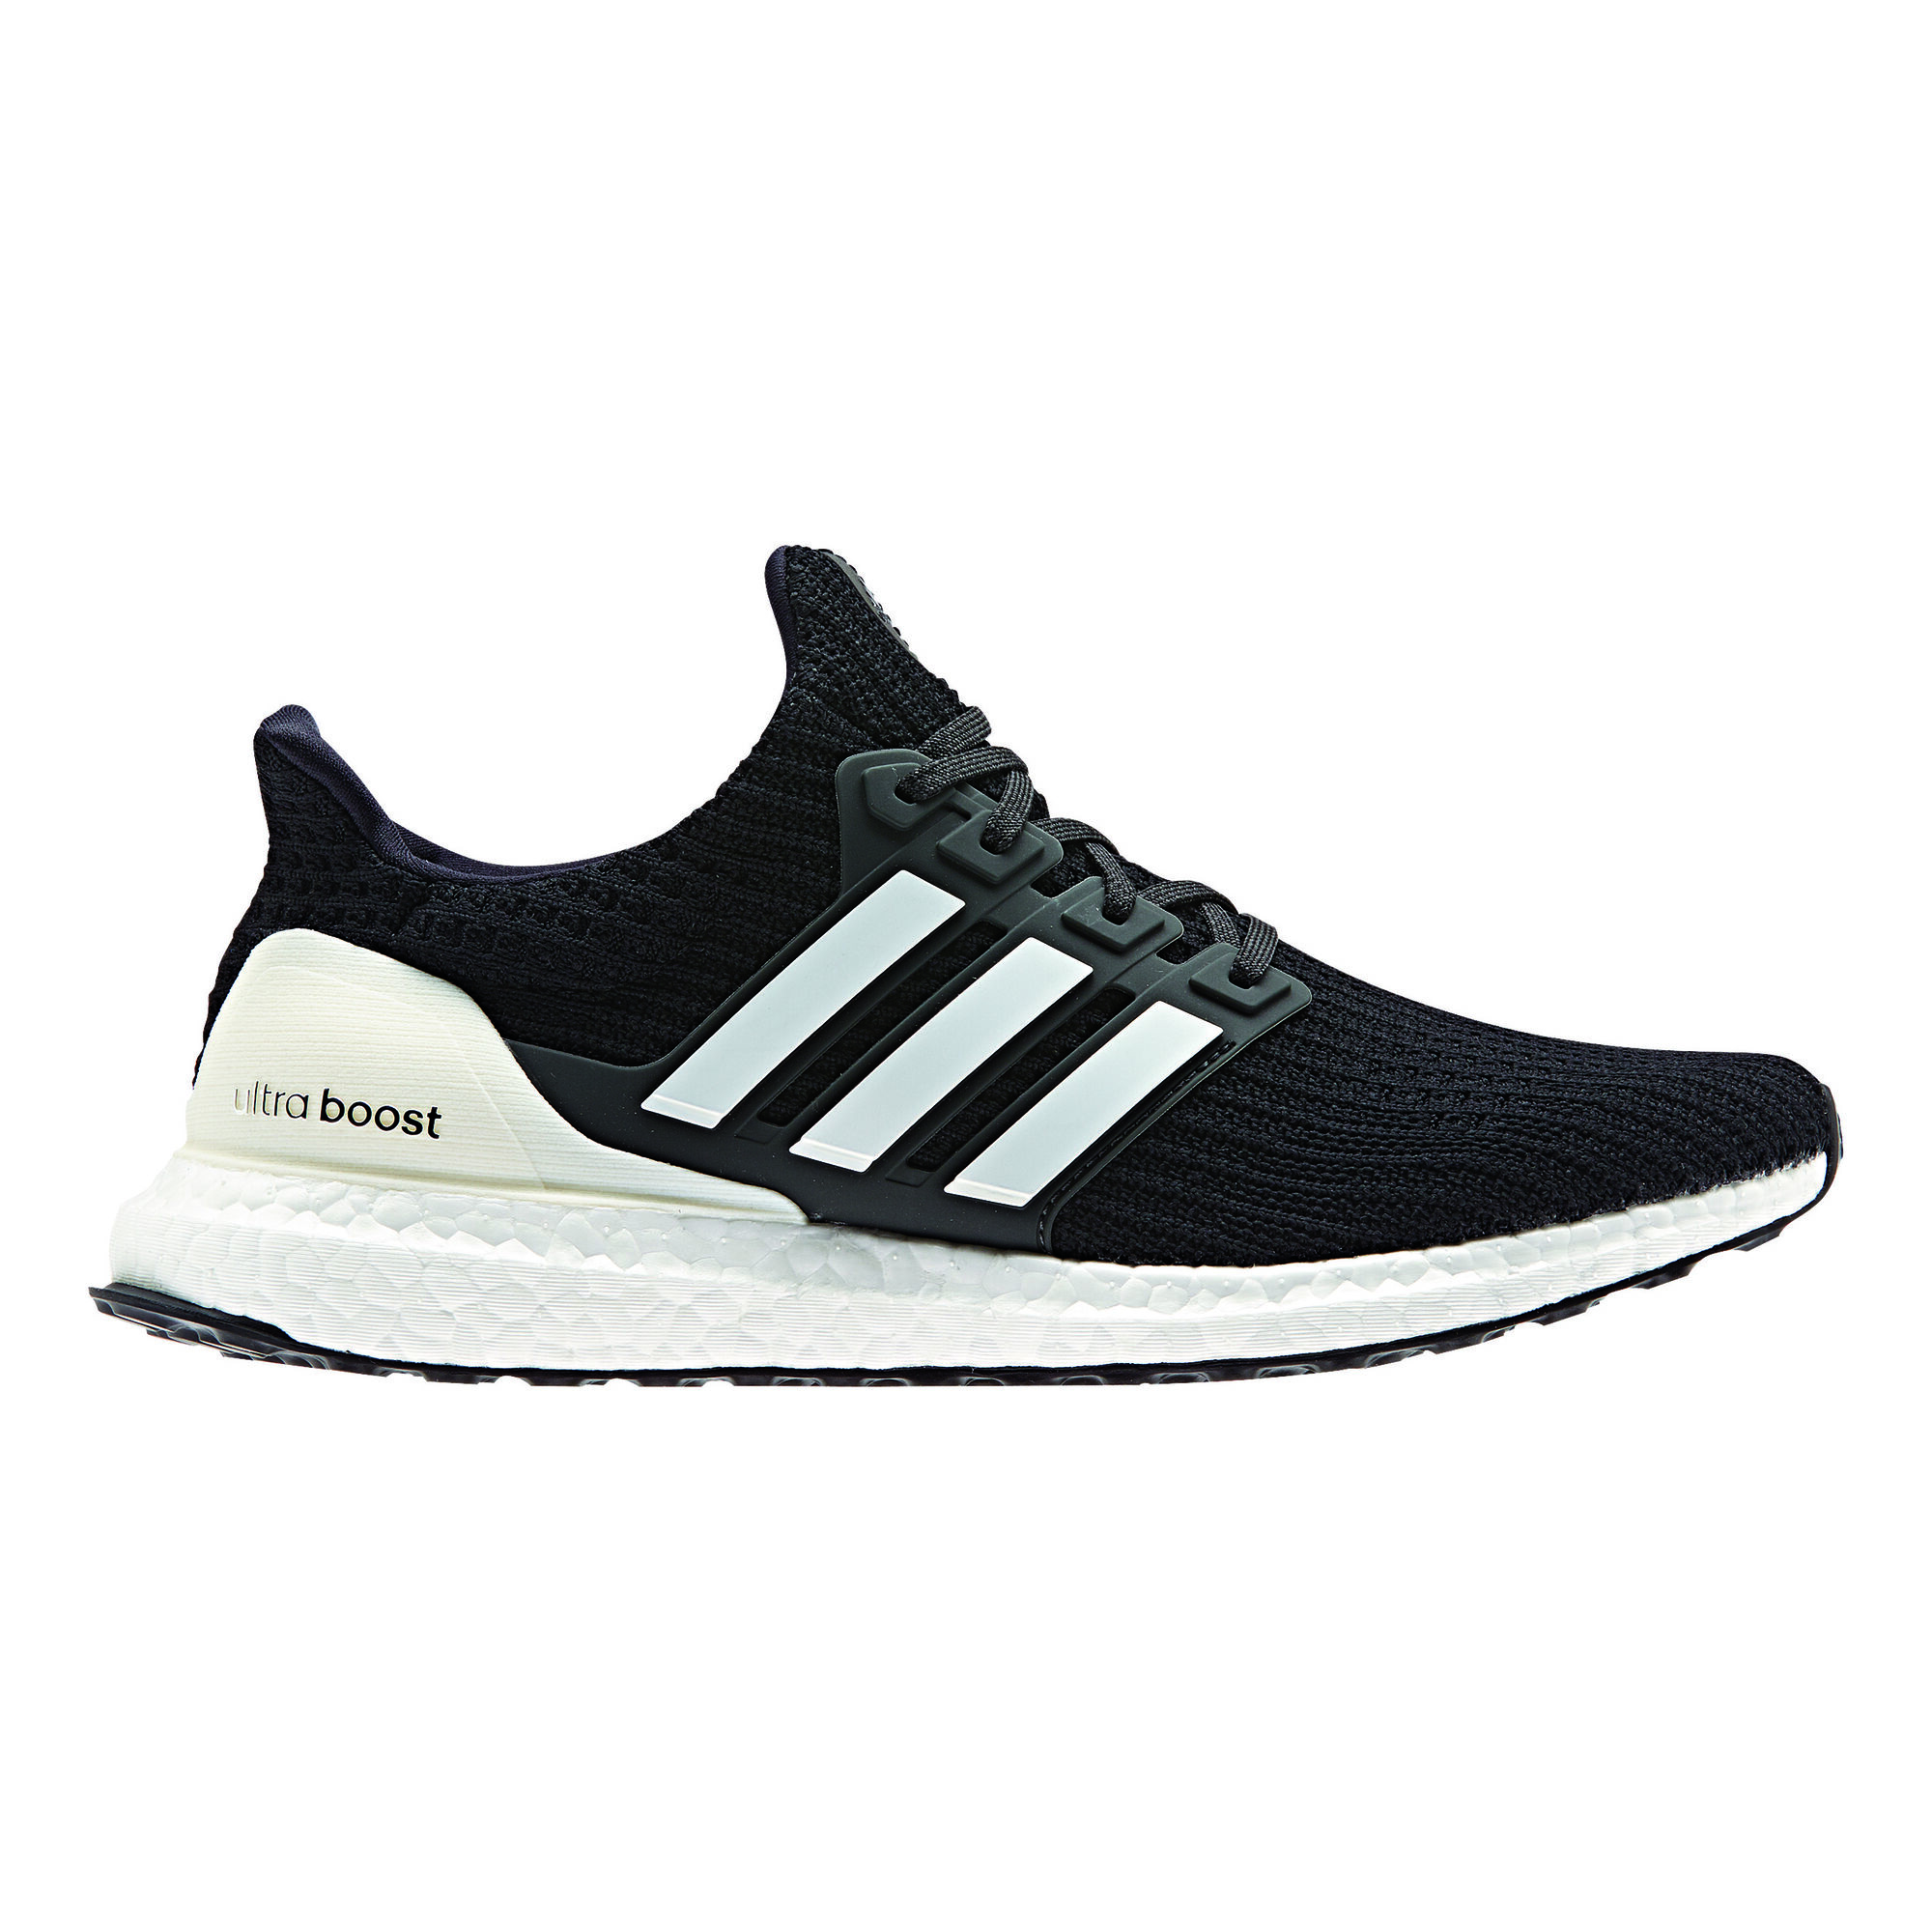 358728628a7 buy adidas Ultra Boost Neutral Running Shoe Men - Black